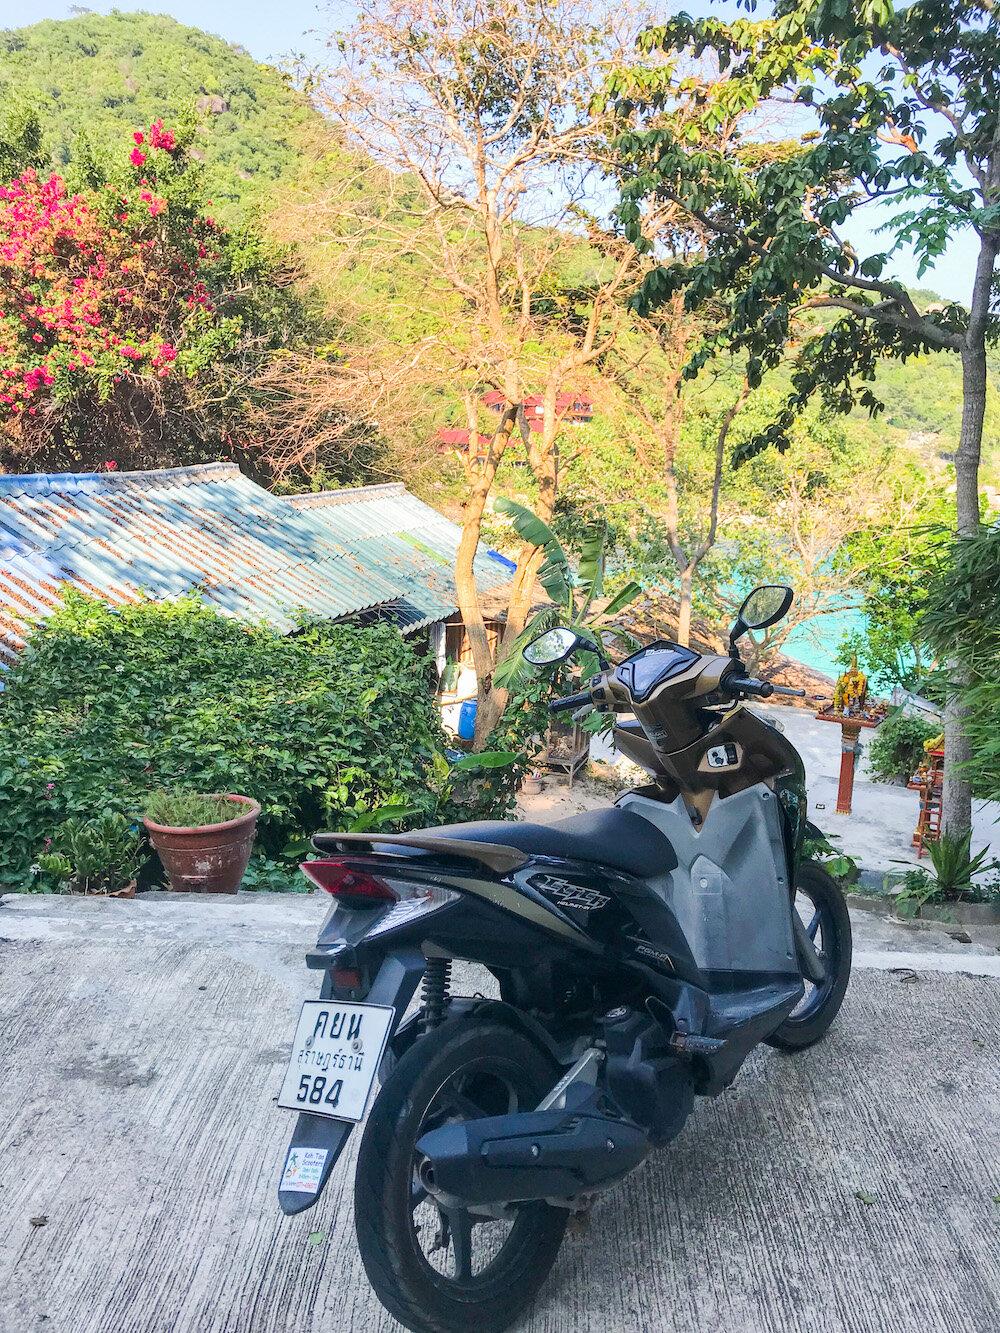 scooter-rental-koh-tao.JPG